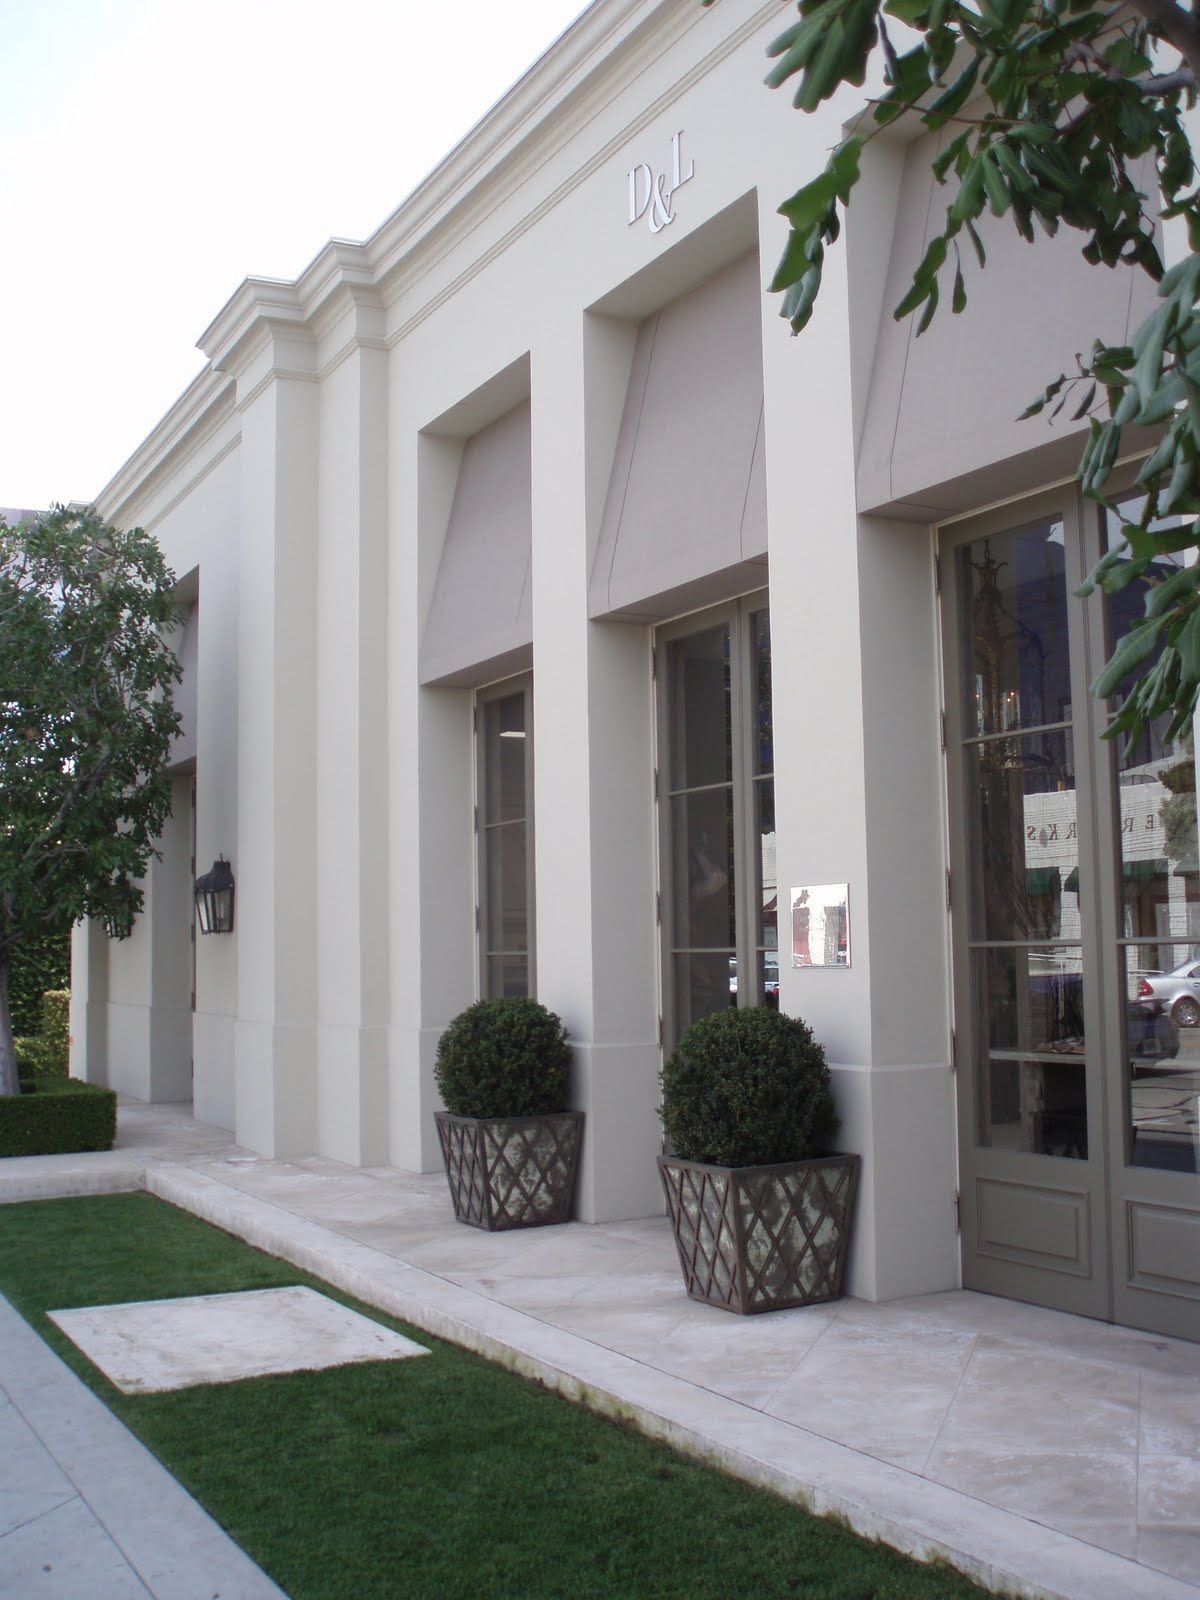 Stucco Awnings Beautiful Custom Narrow-stile Paneled Doors. Dennis & Leen L